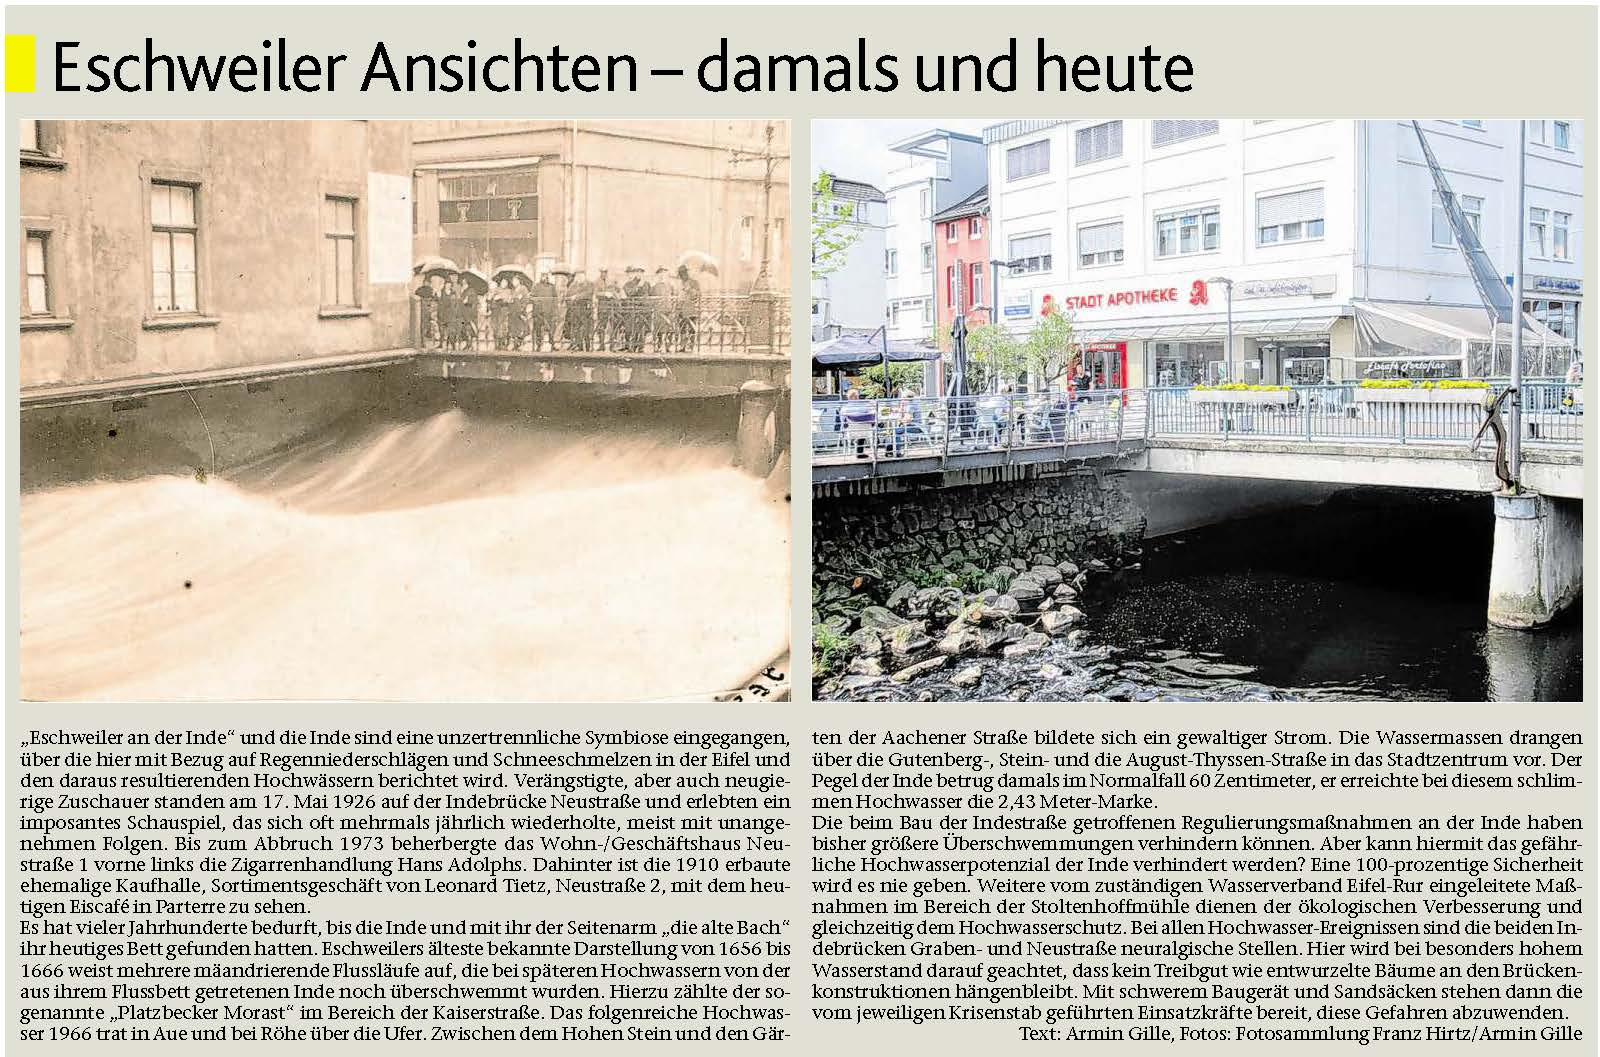 stadt apotheke eschweiler